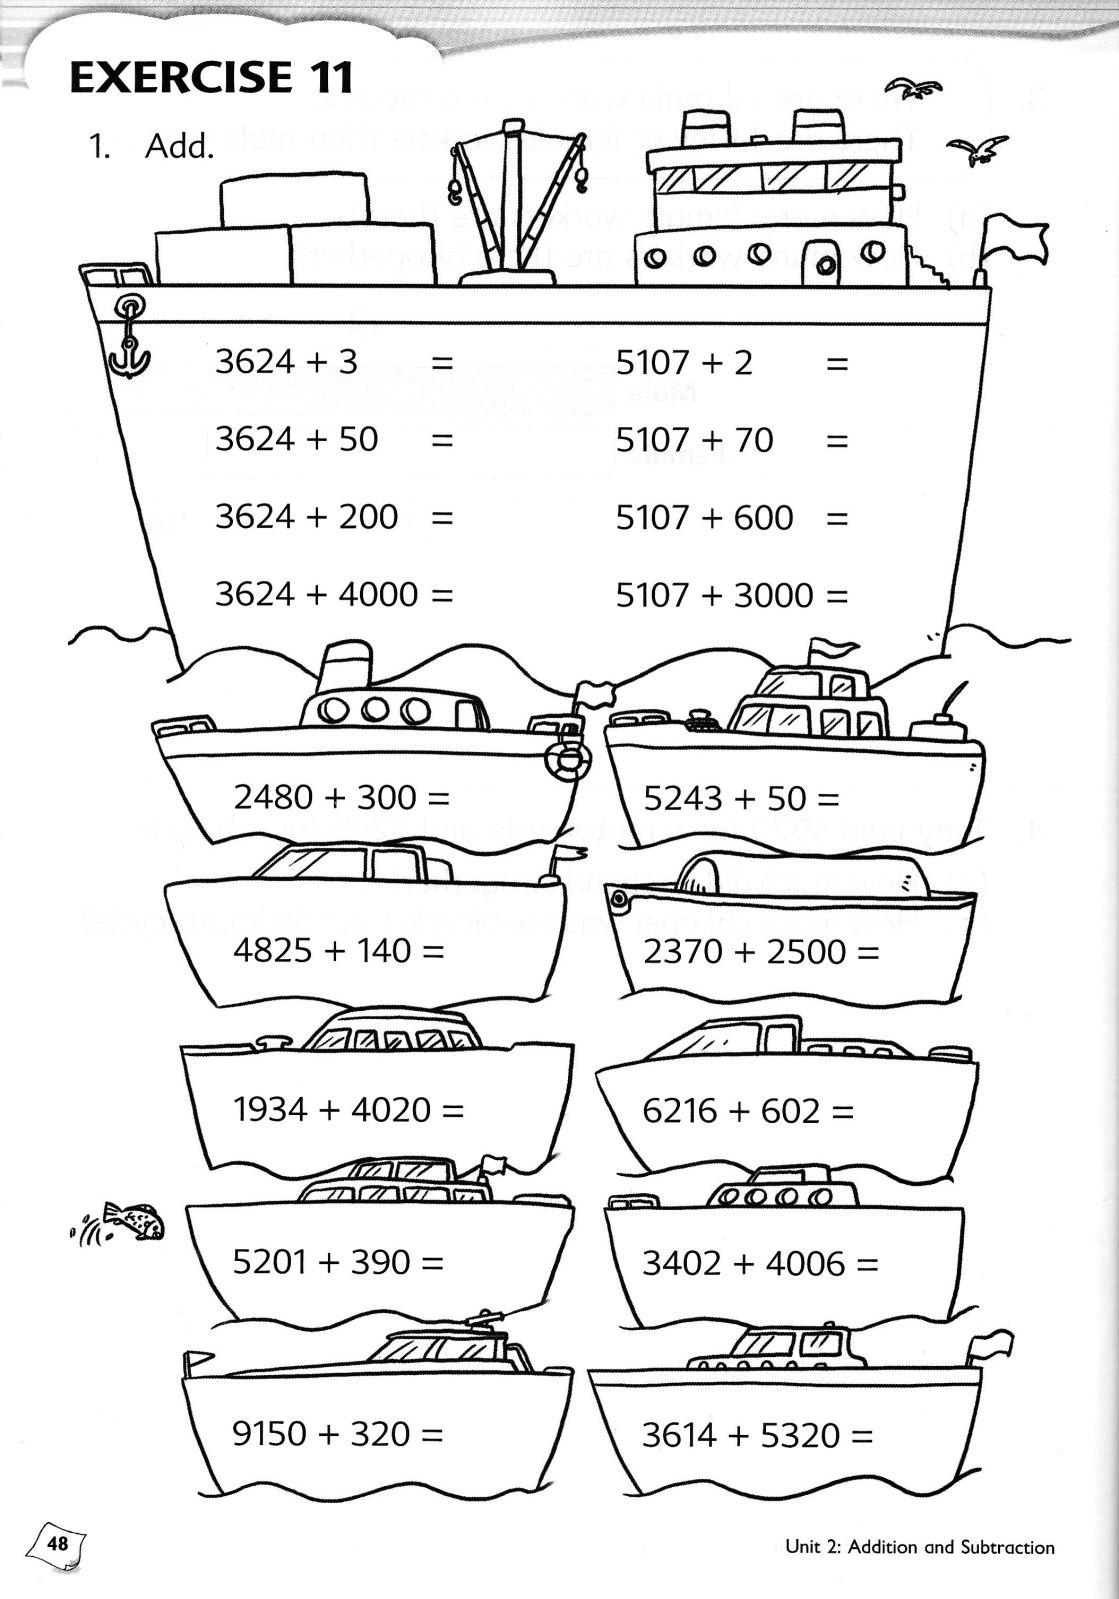 Singapore Maths Worksheets Singapore Math Worksheets Grade 1 Free – Singapore Math Kindergarten Worksheets